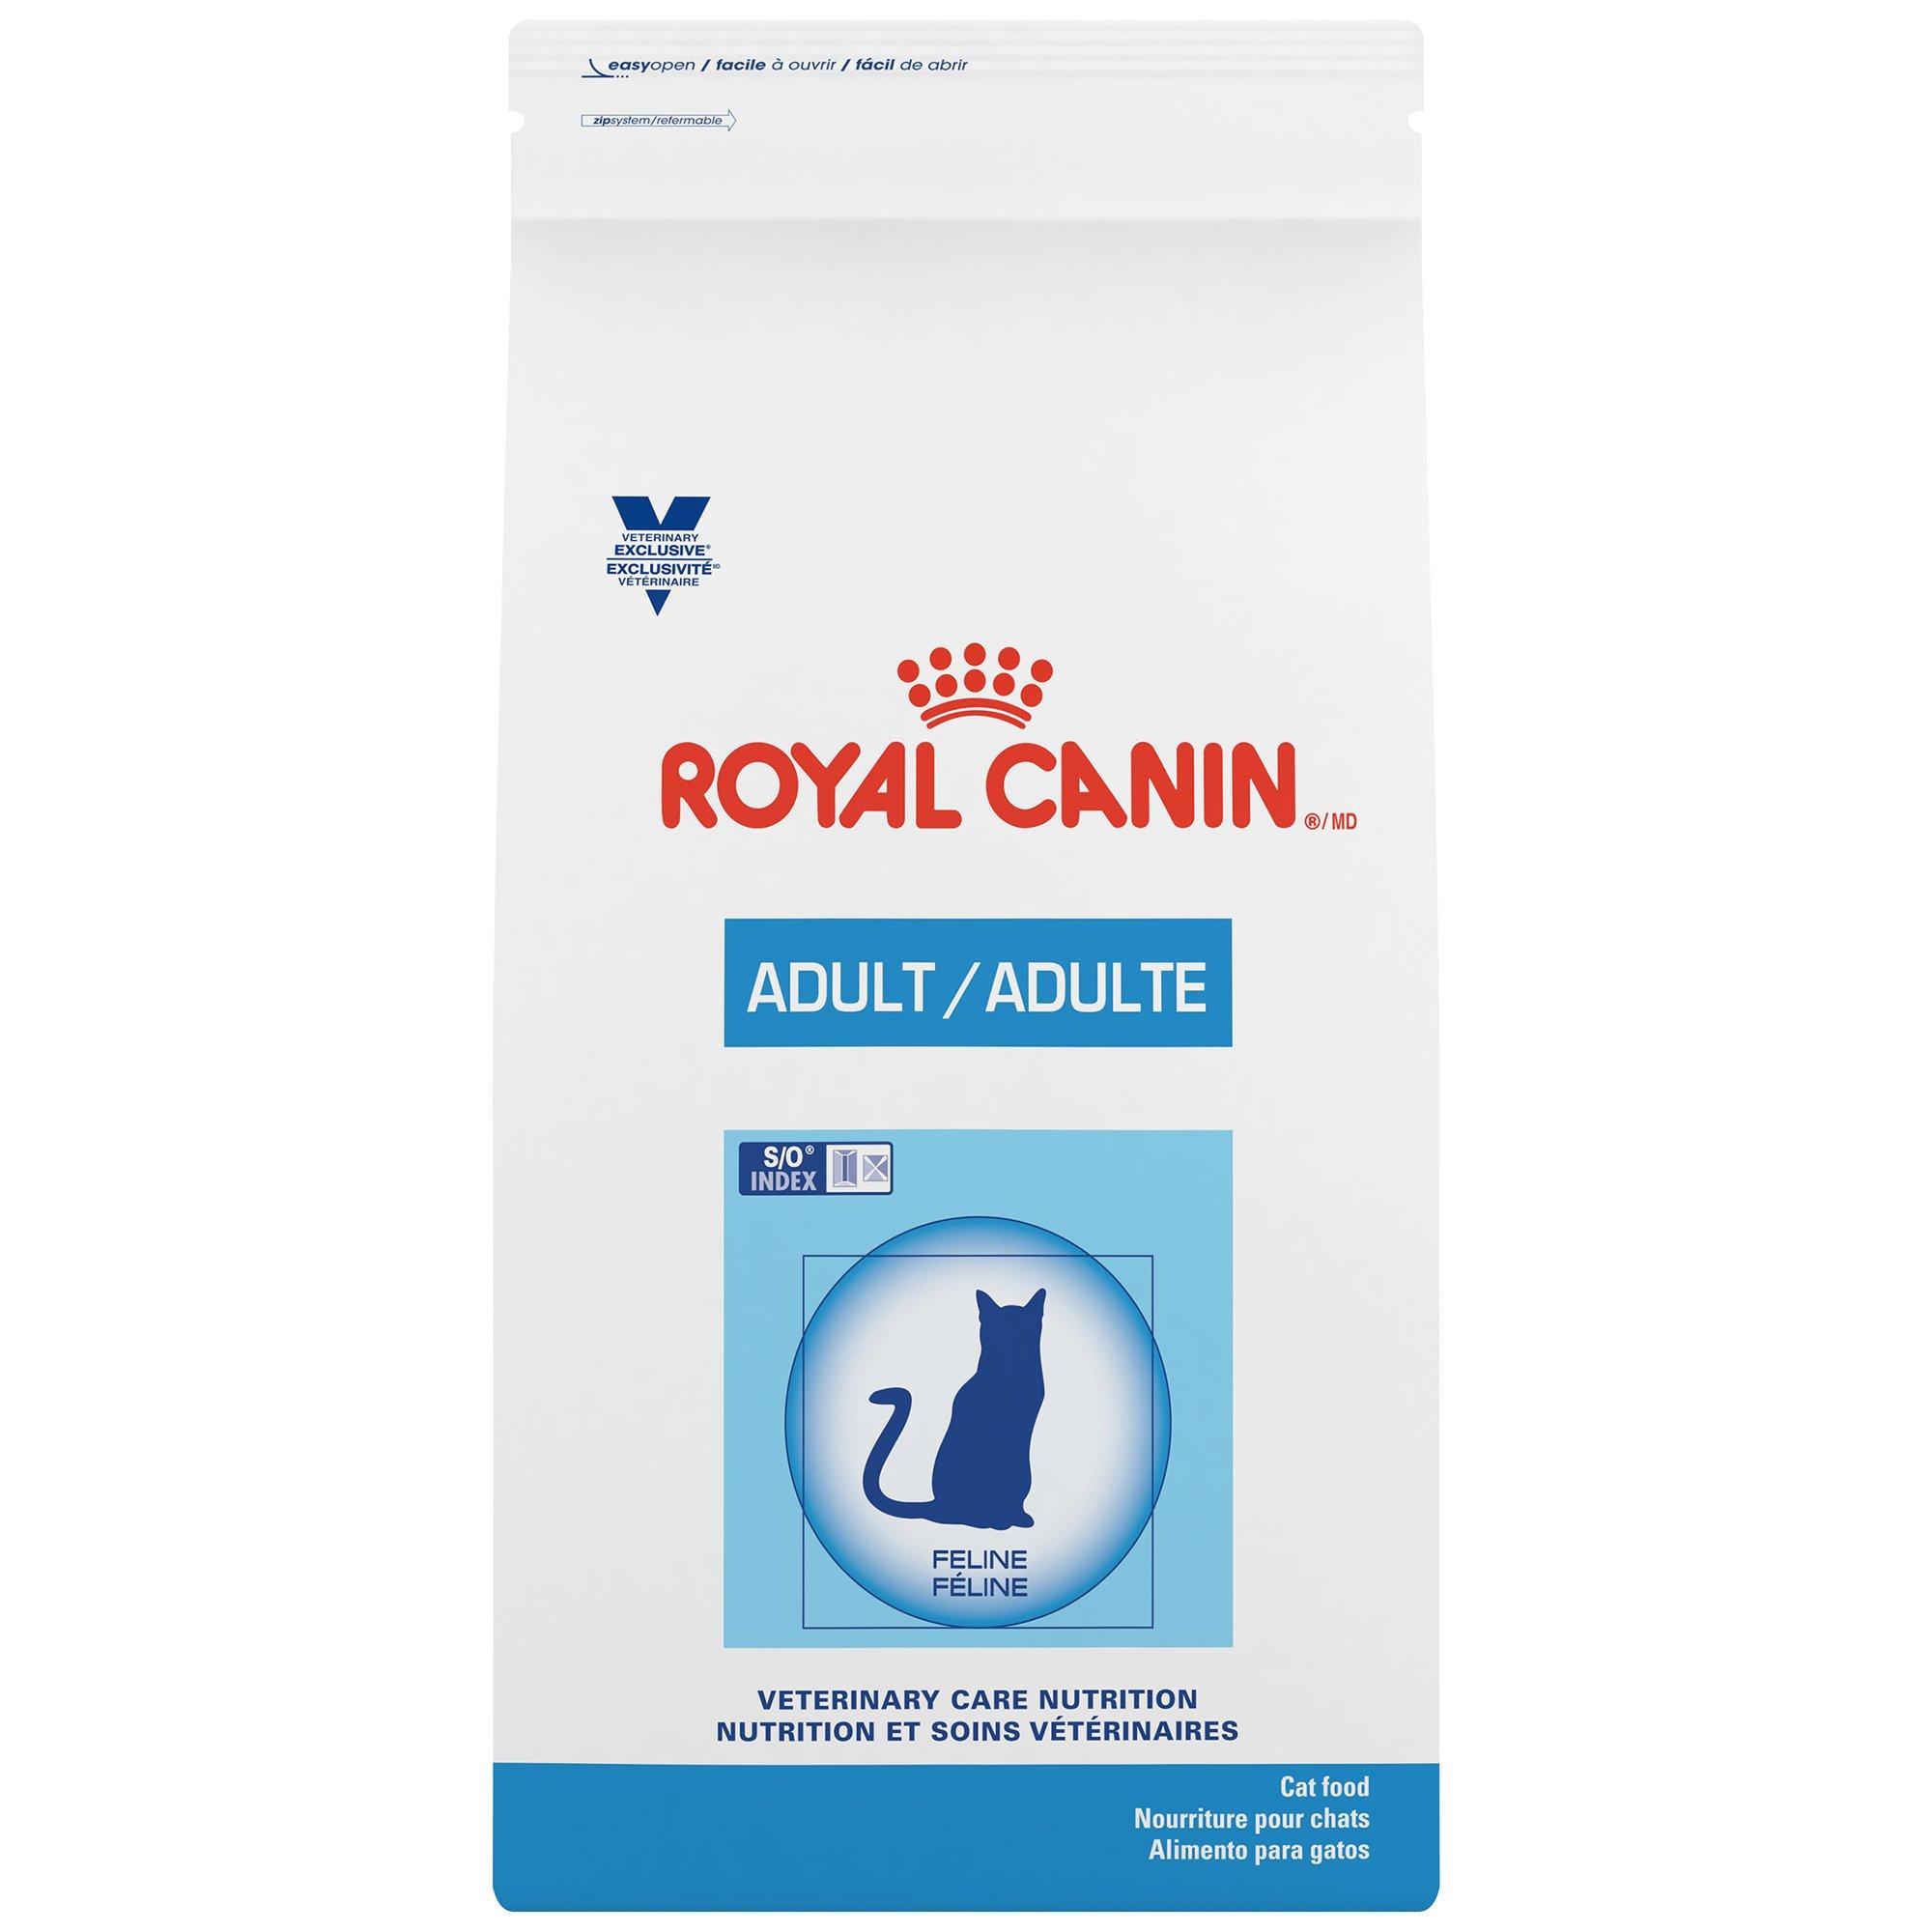 royal canin veterinary care nutrition feline adult dry cat food petco. Black Bedroom Furniture Sets. Home Design Ideas